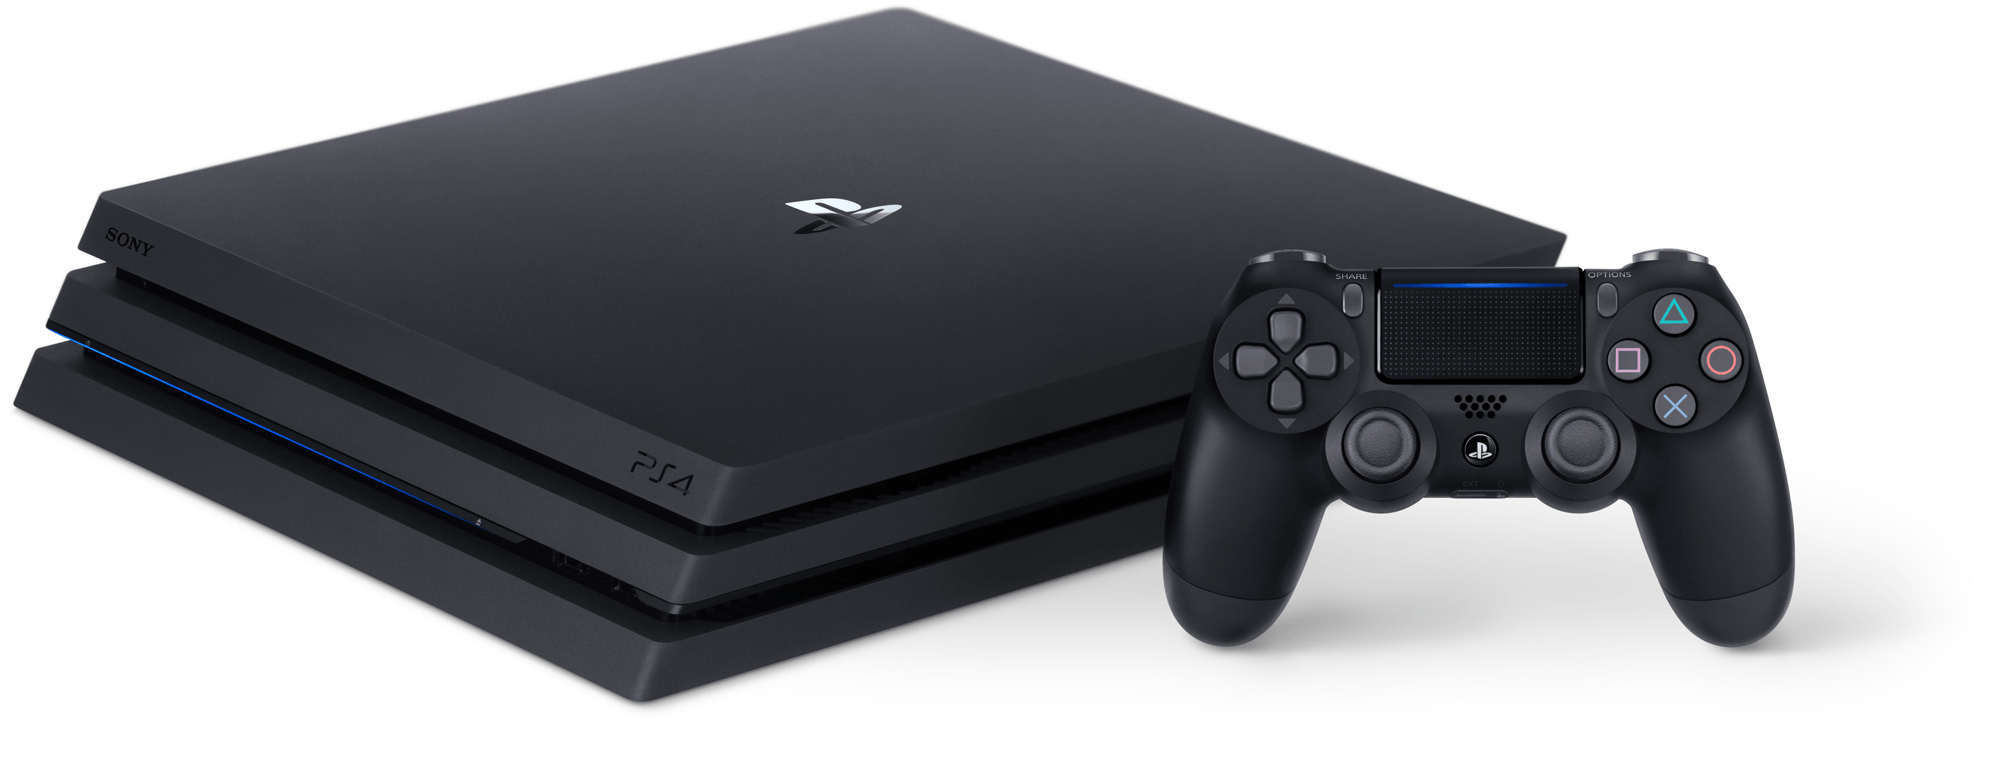 Architecture AMD, SSD, ray tracing… : la PlayStation 5 sera une console classique (mais mieux que la PS4)